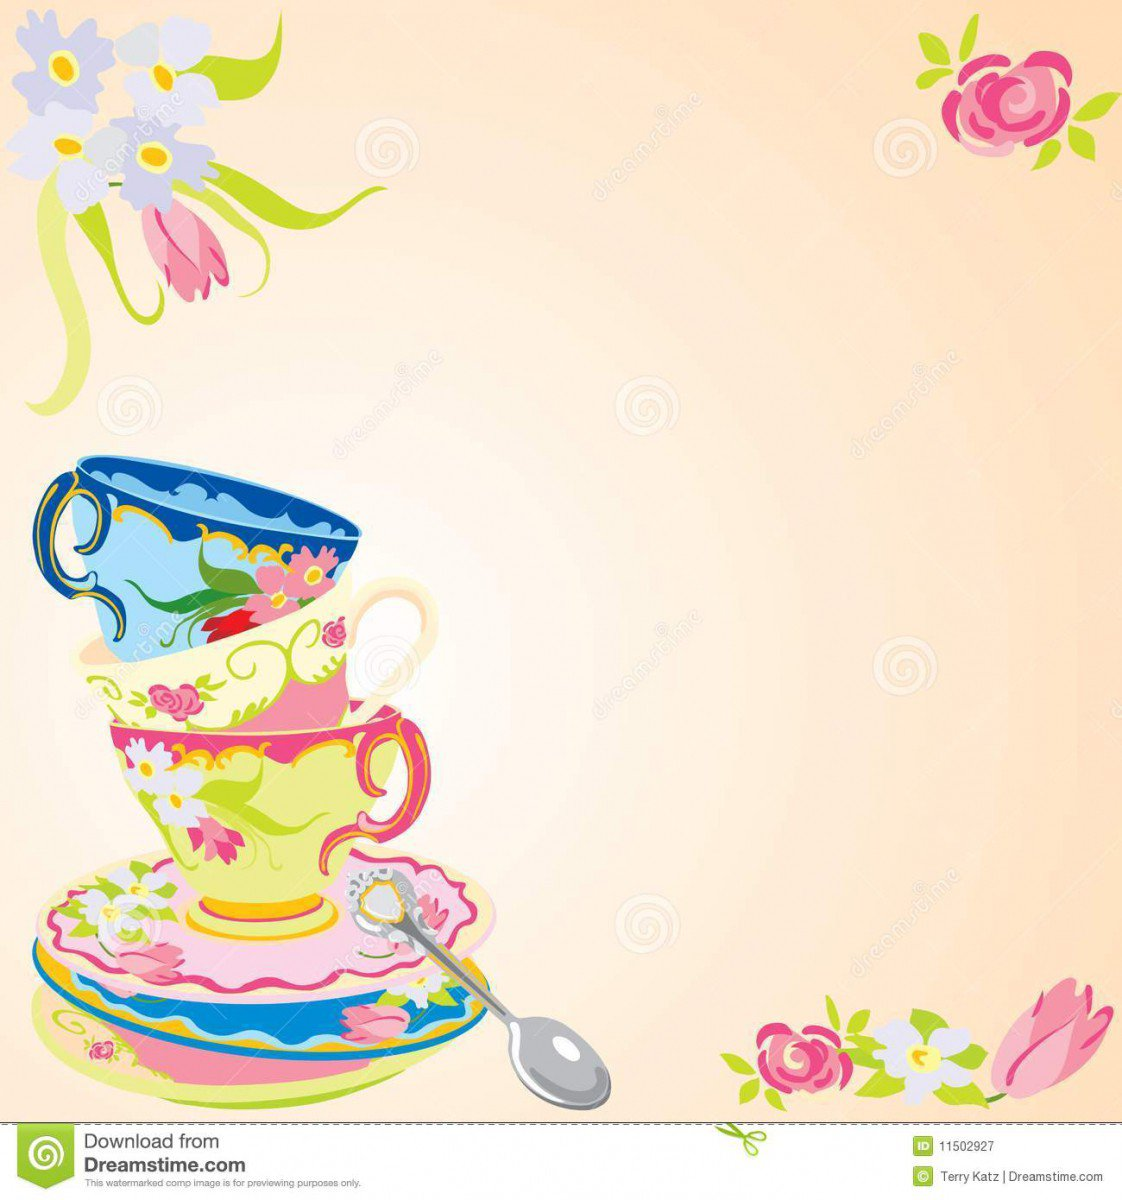 Free Printable High Tea Party Invitations